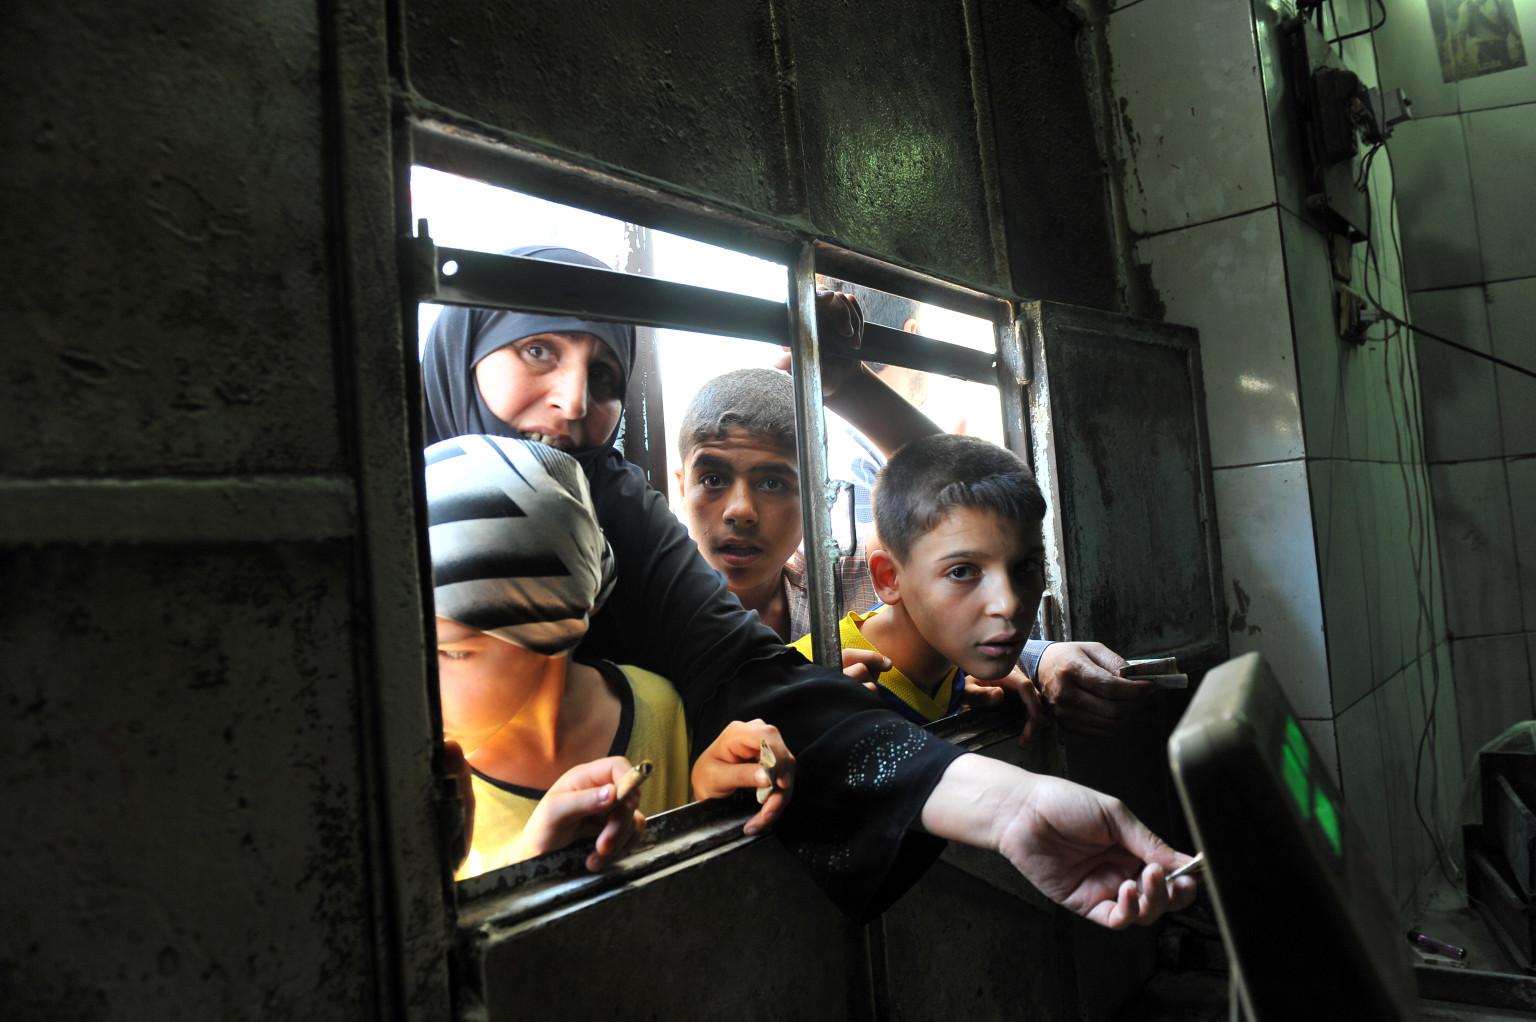 Mosalsalat ramadan 2014 syria view original updated on 10 20 2014